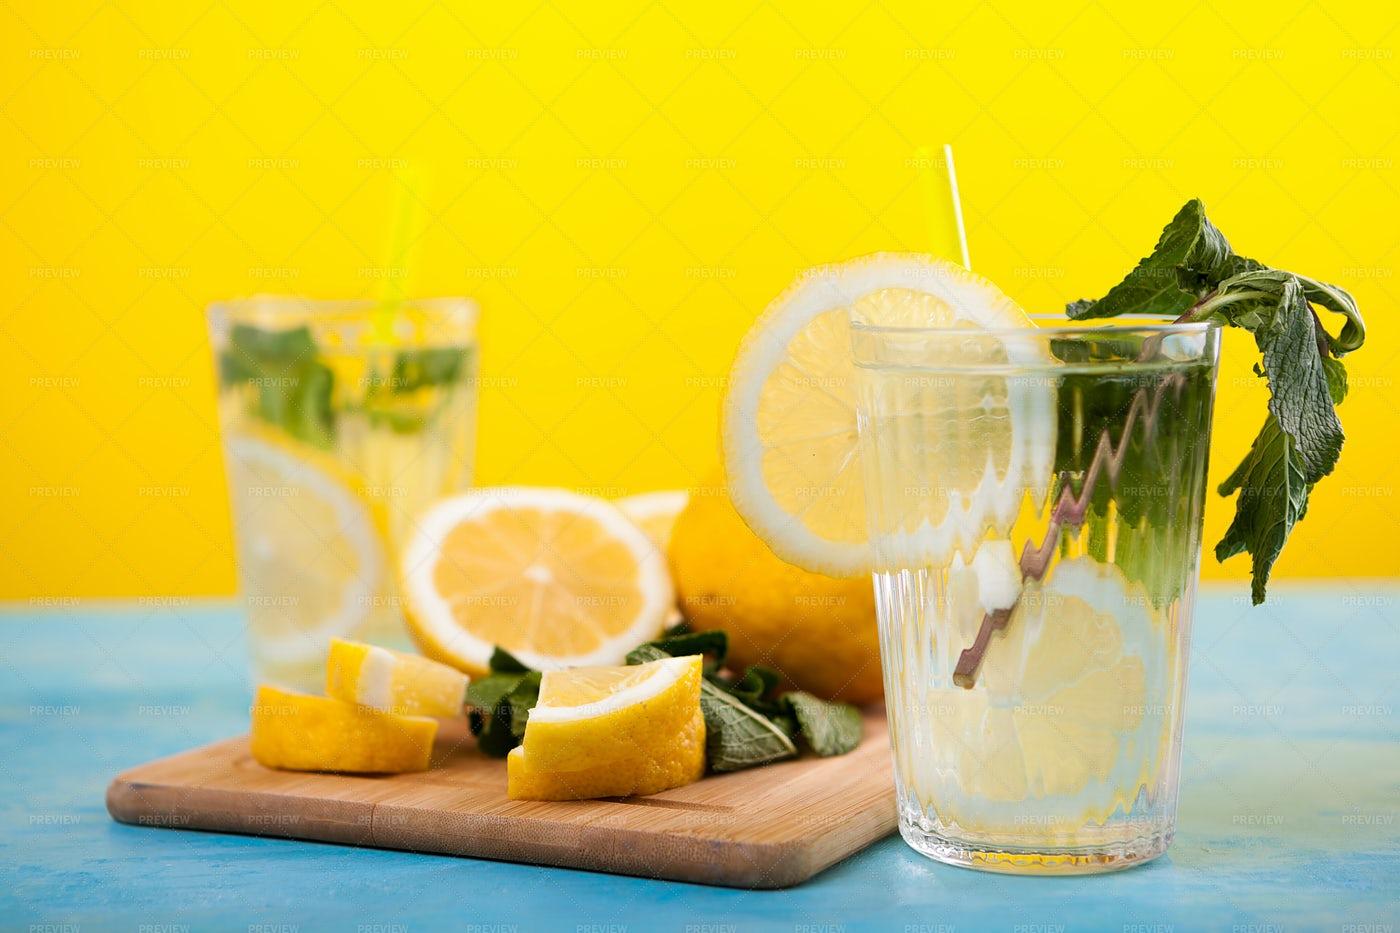 Homemade Detox Lemonade: Stock Photos